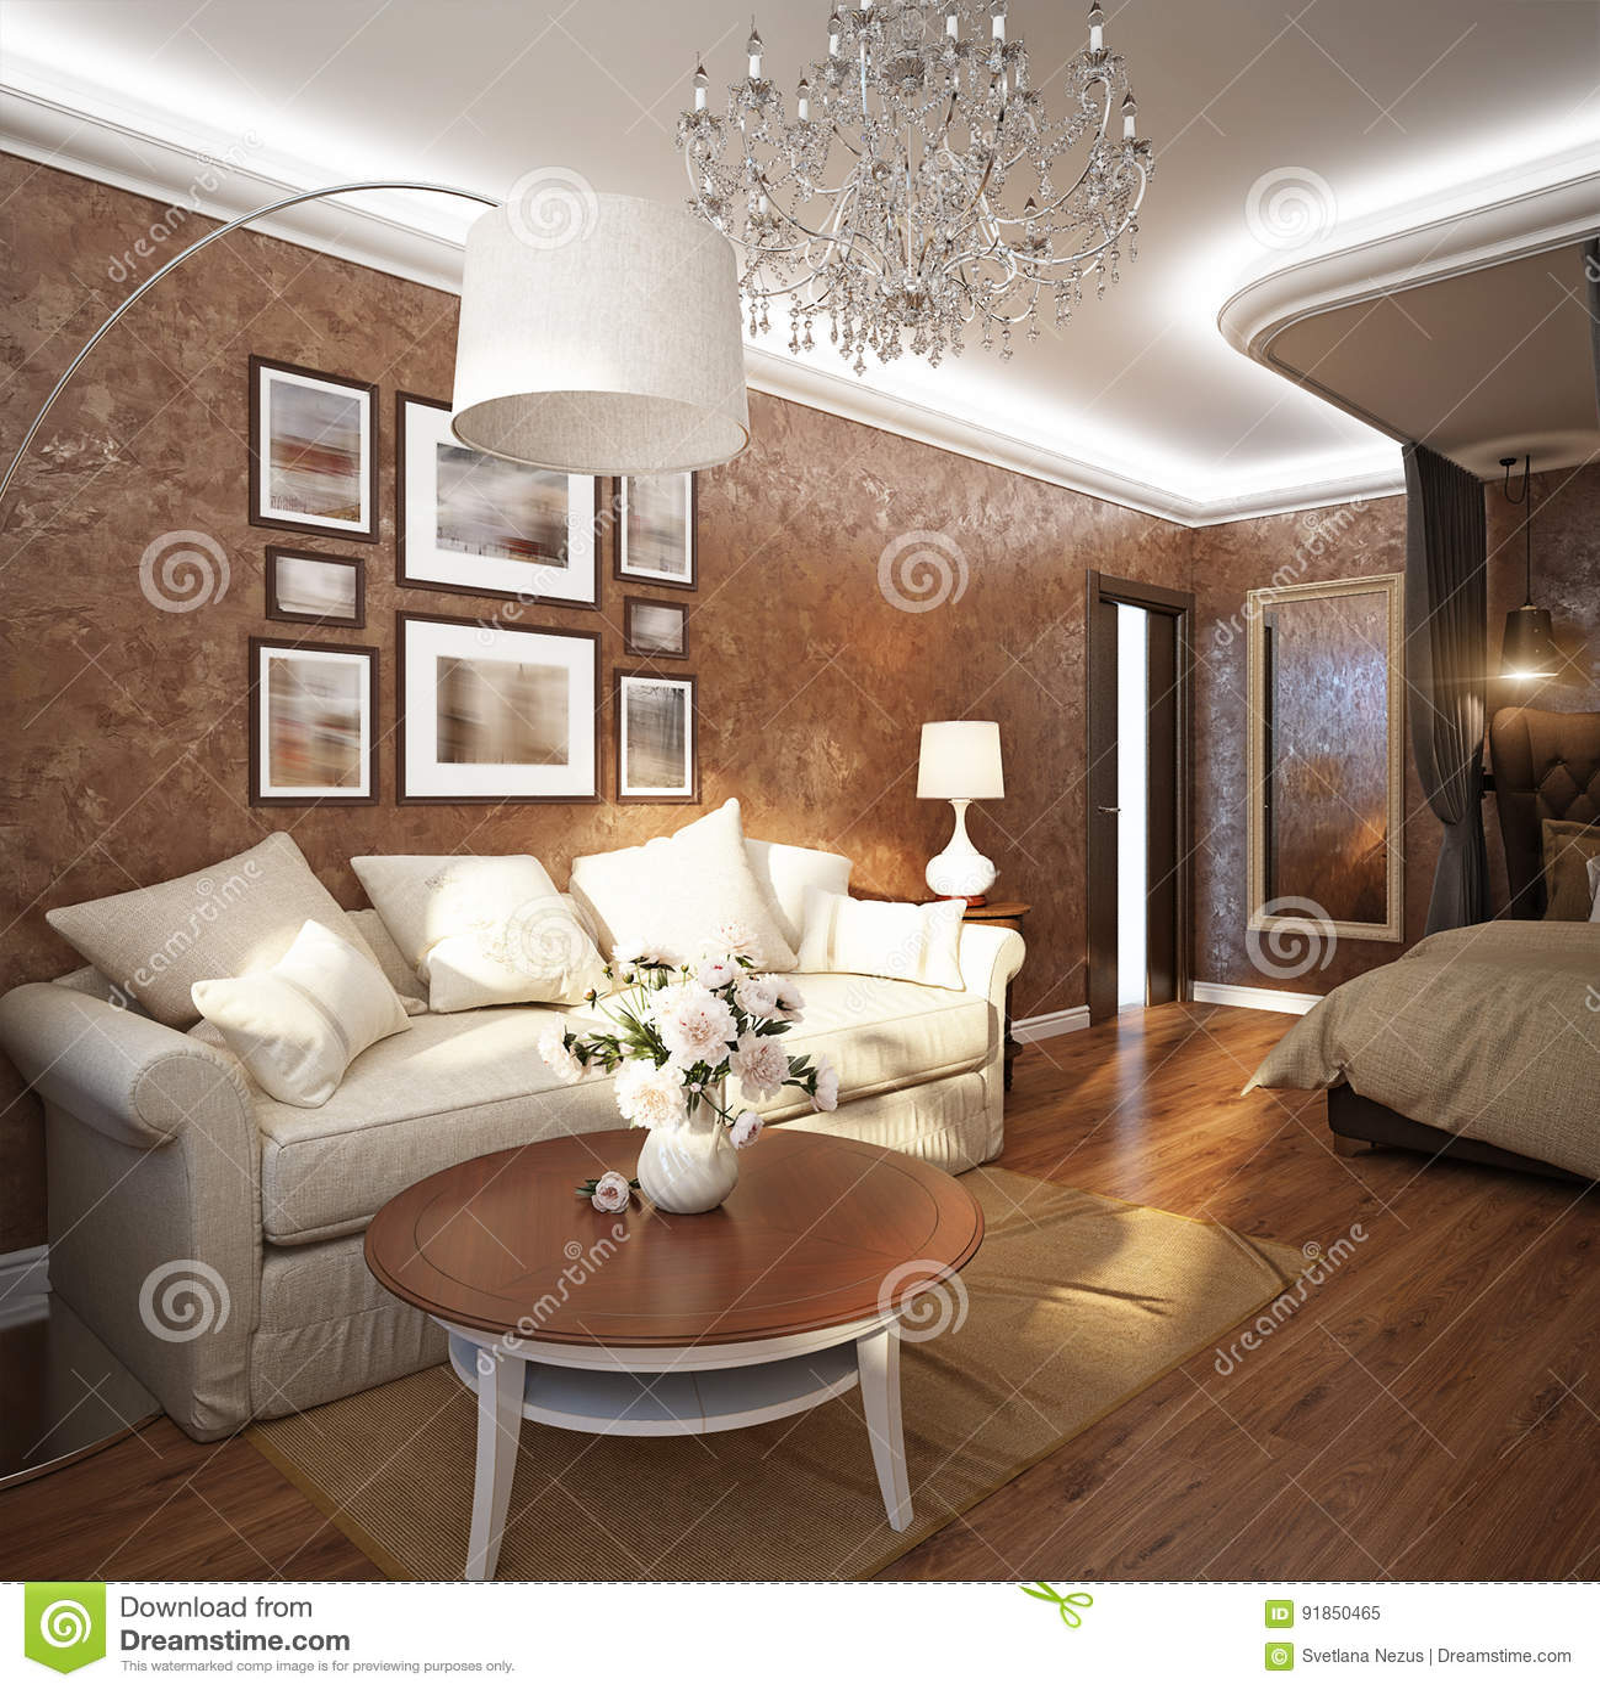 Bedroom Rendering Bedroom Ceiling Uplighters Childrens Bedroom Wallpaper Bedroom Black White: Classic Modern Room Home Office, Living Room Or Bedroom